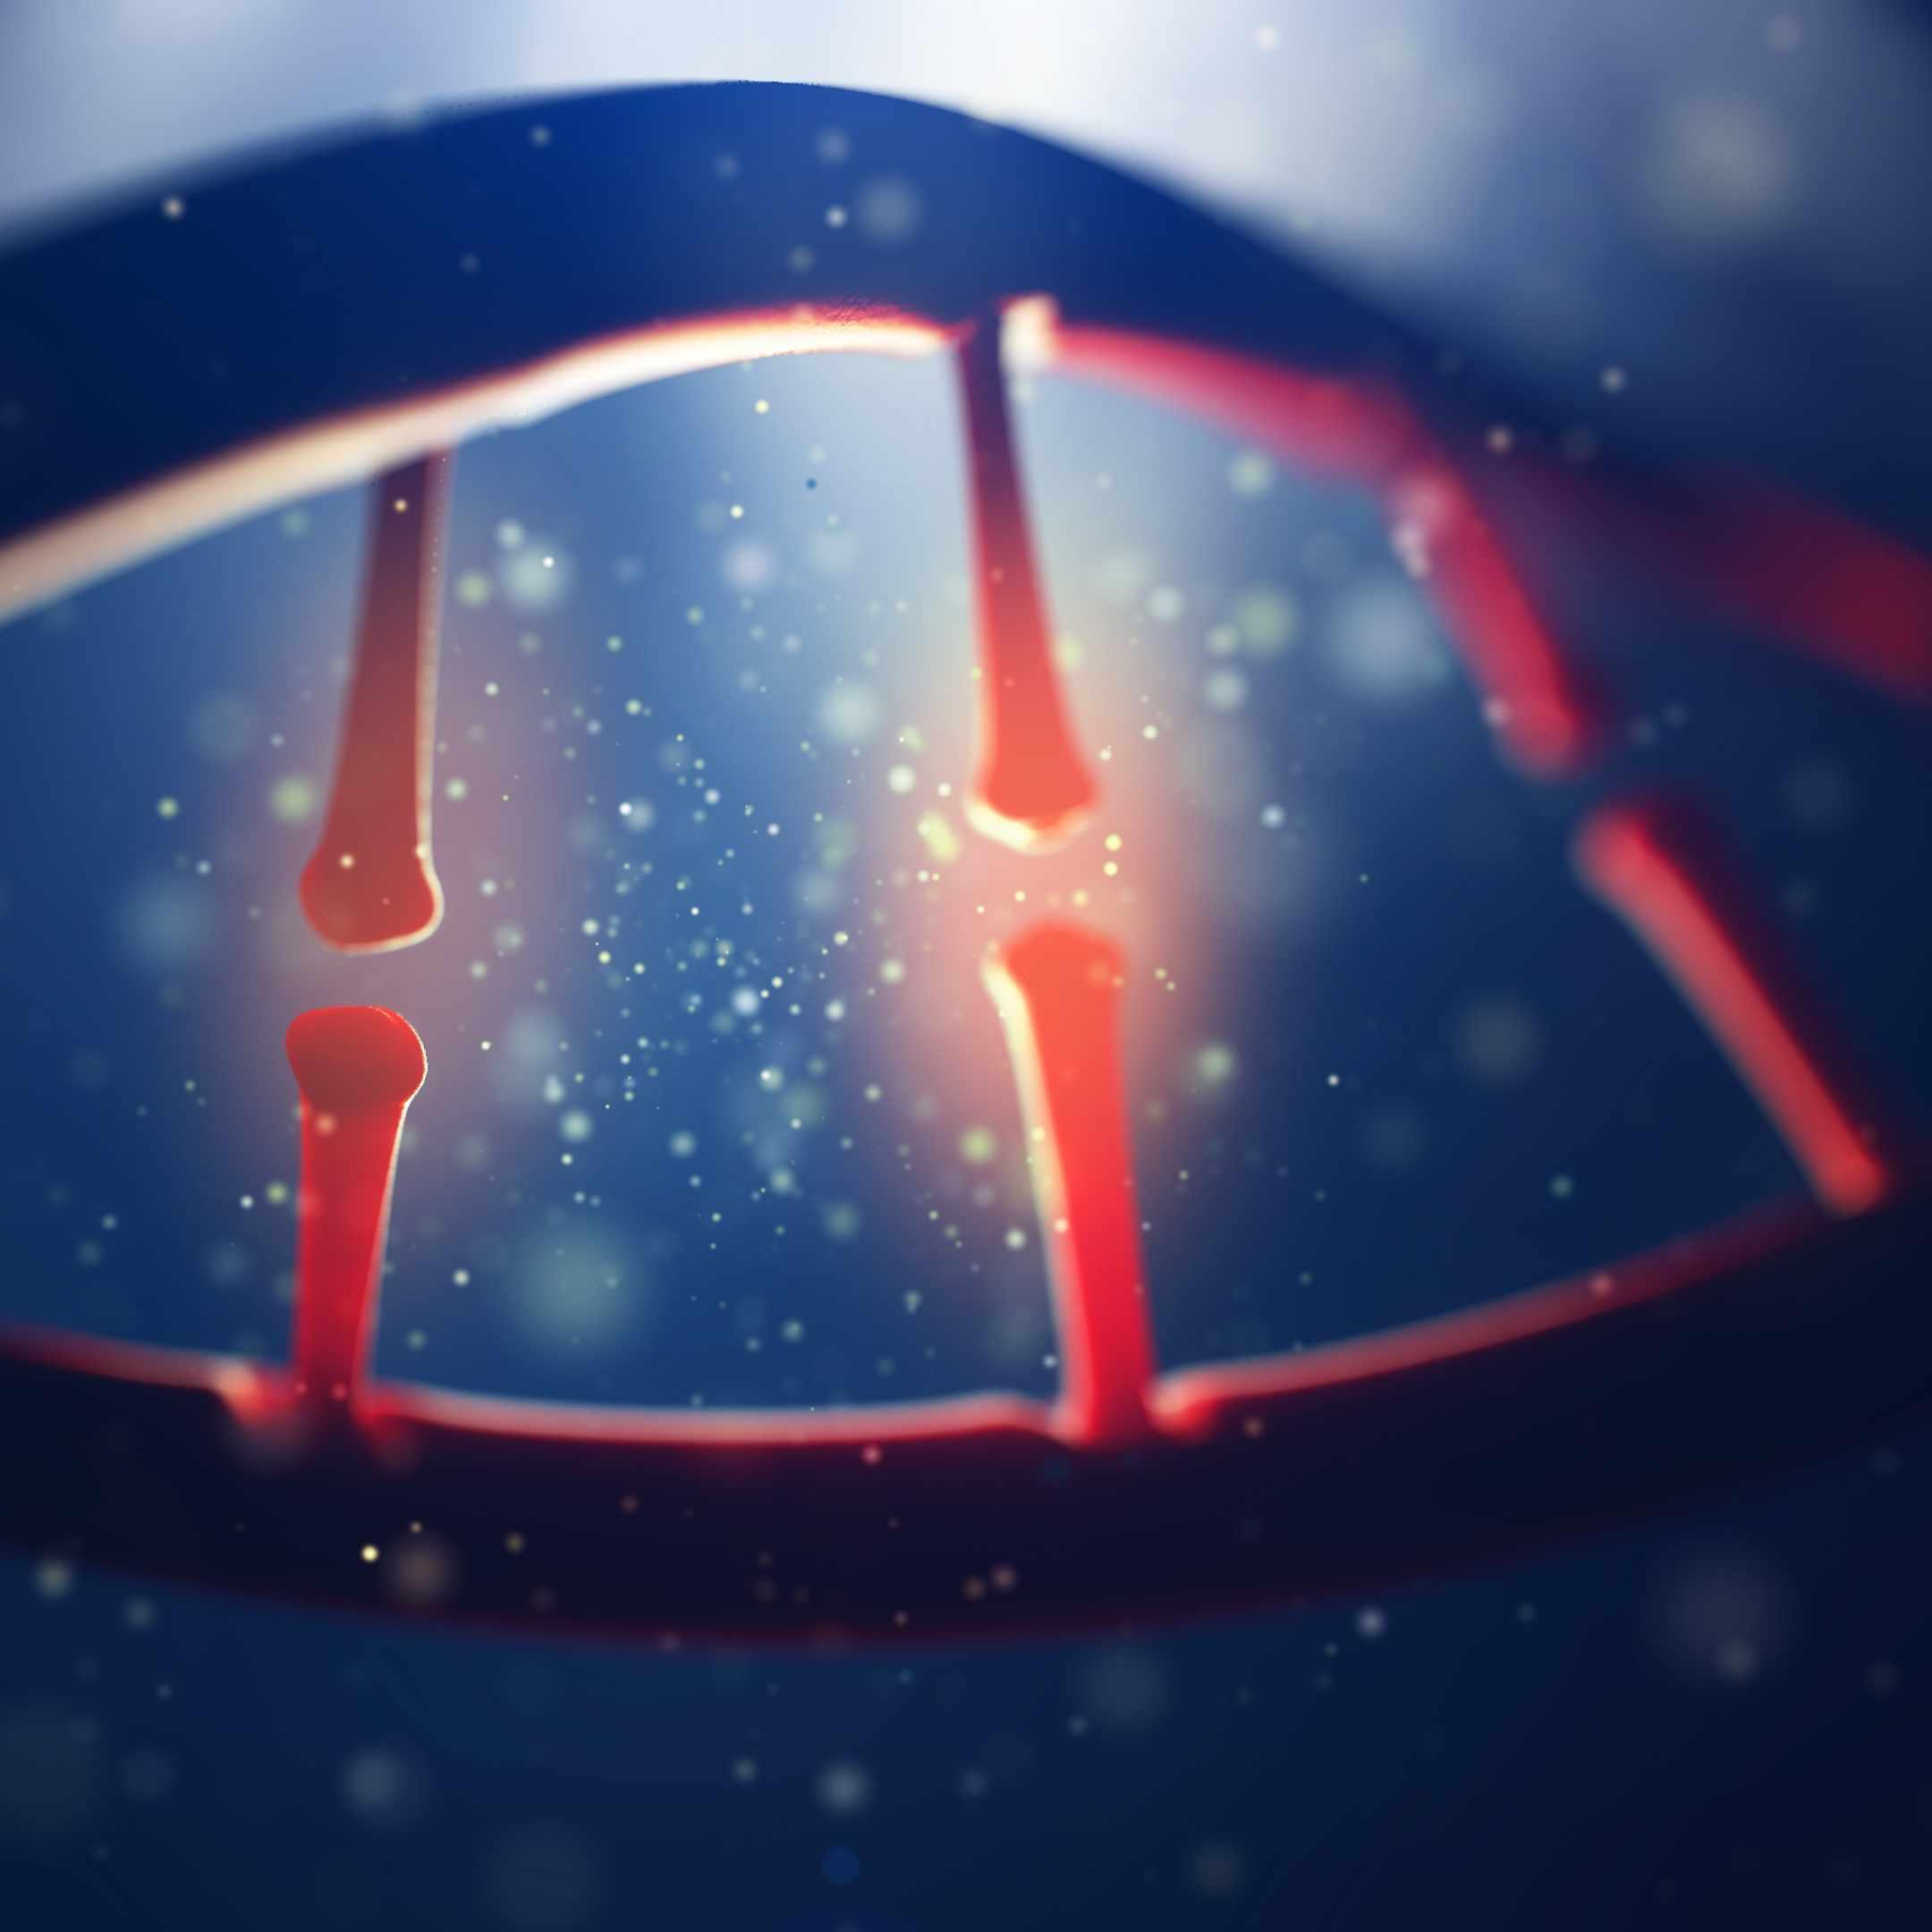 Image of human genome